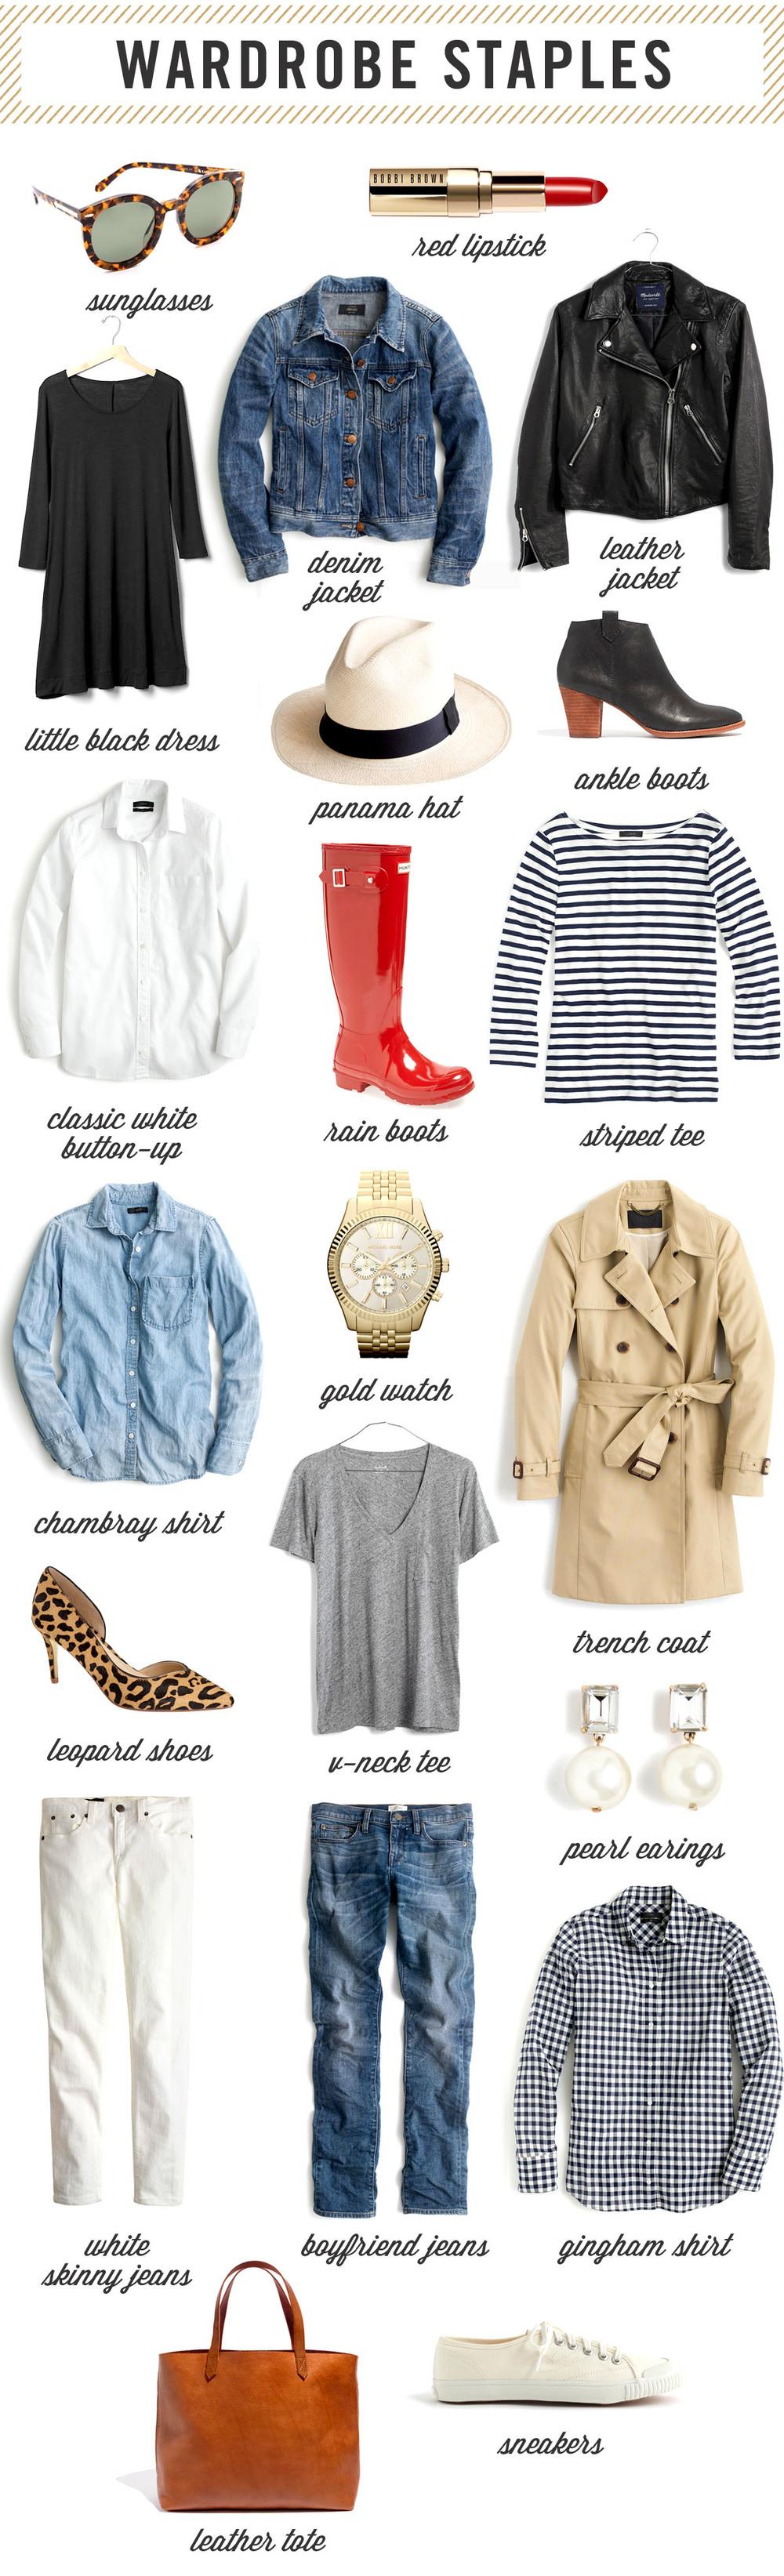 9316c9af16 Wardrobe Staples Every Woman Needs — West Coast Capri